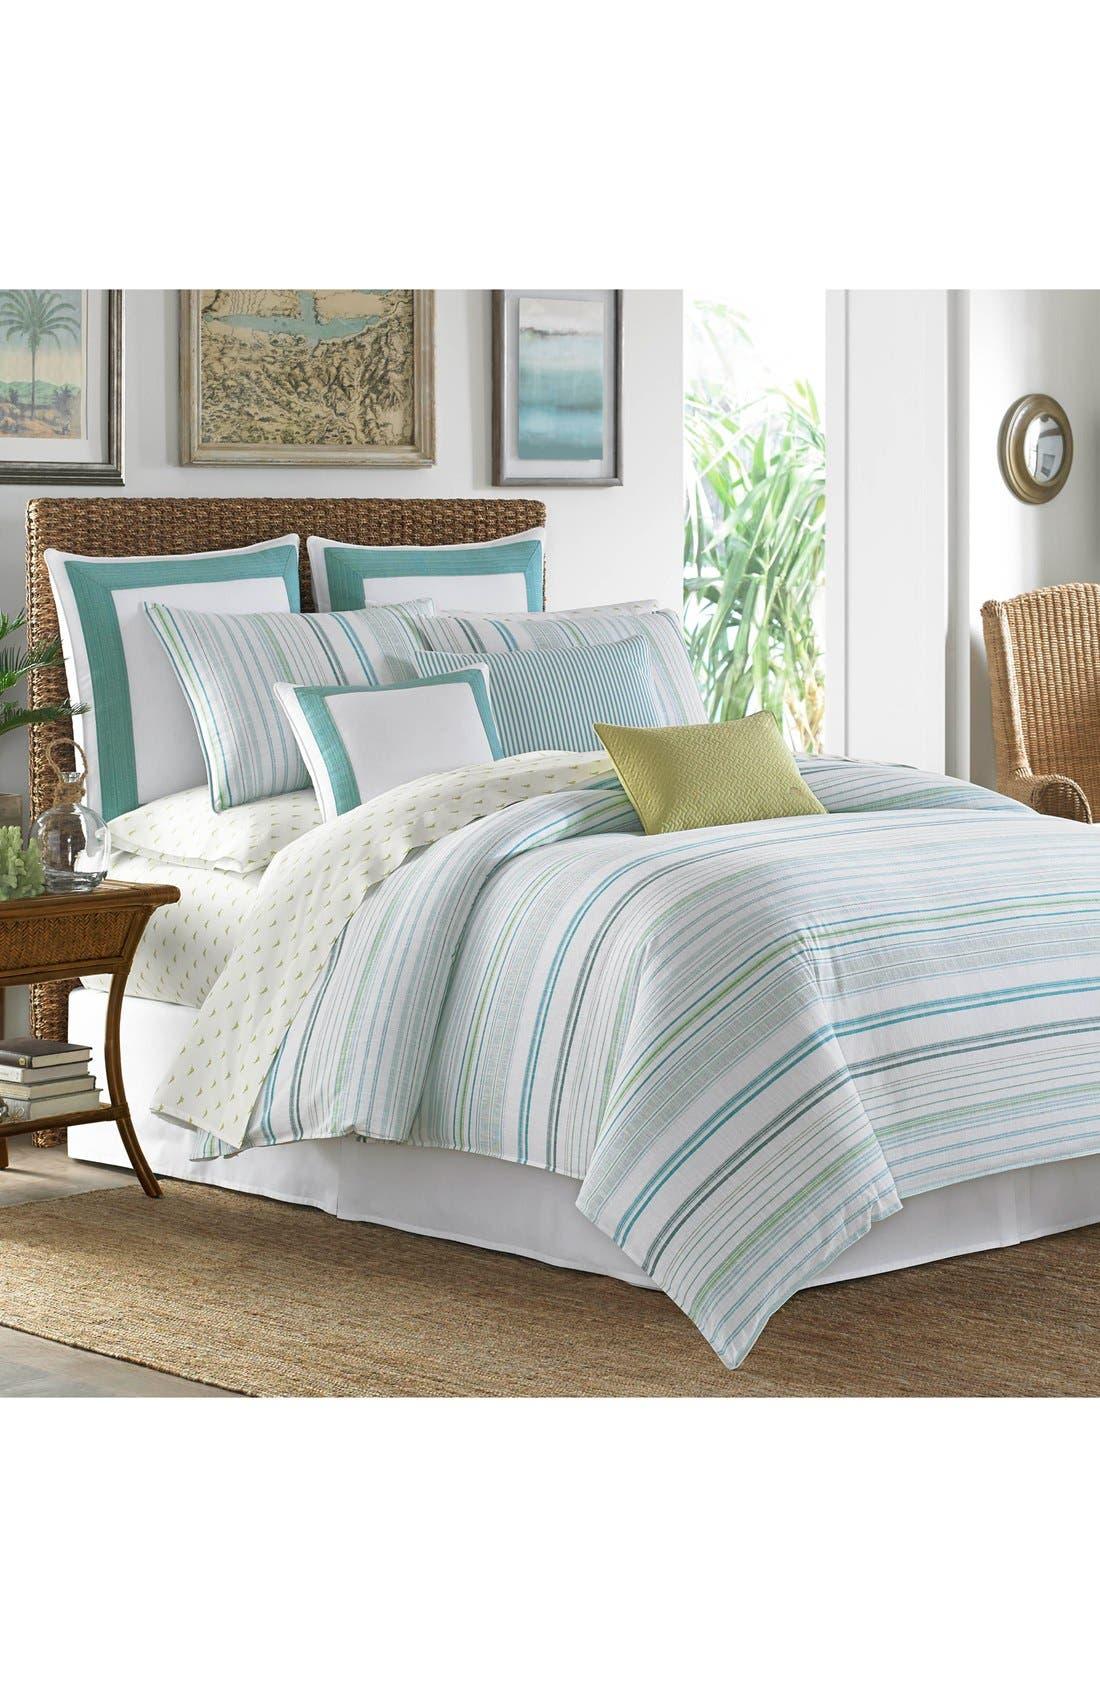 La Scala Breezer Comforter, Sham & Bed Skirt Set,                             Alternate thumbnail 3, color,                             440